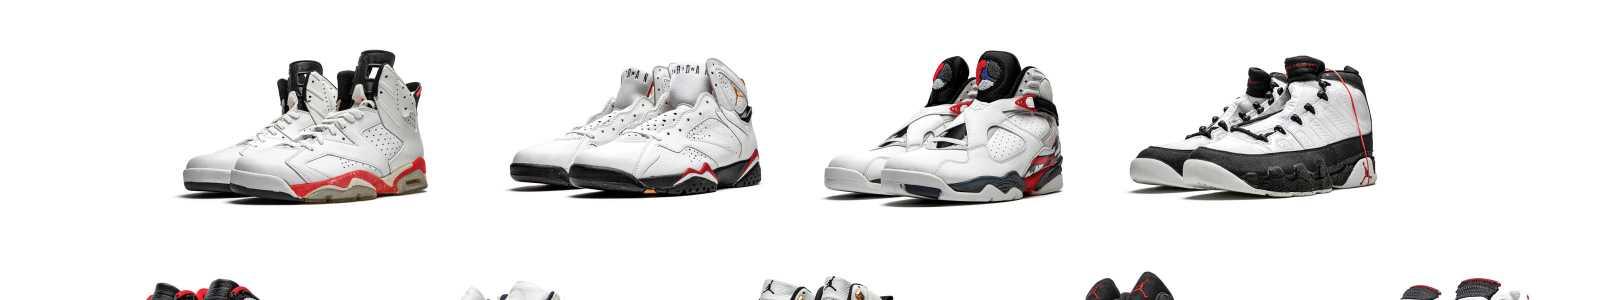 Original Air Takes Flight: The Evolution and Influence of Air Jordan Sneakers